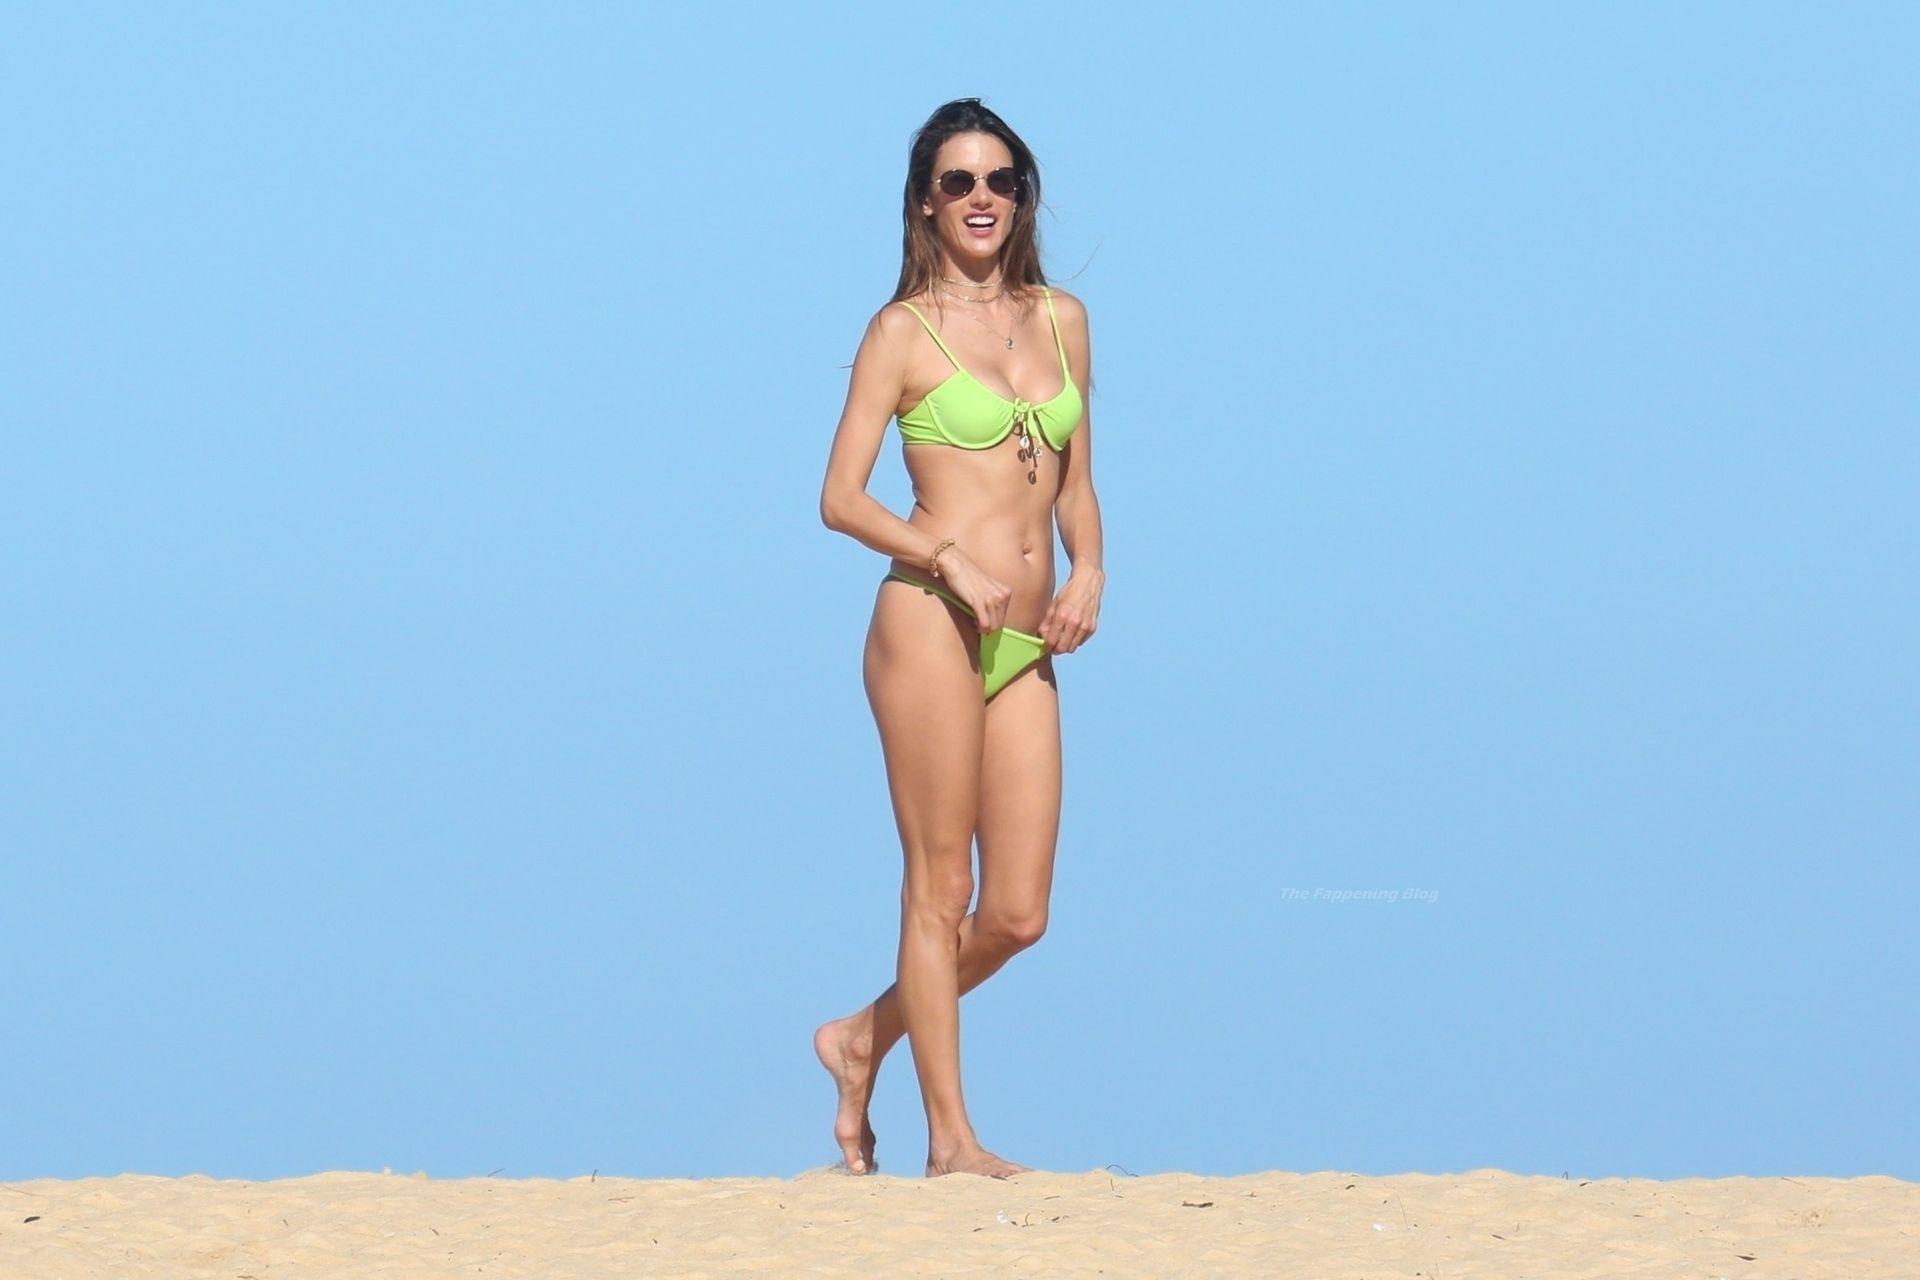 Alessandra-Ambrosio-Sexy-The-Fappening-Blog-101.jpg